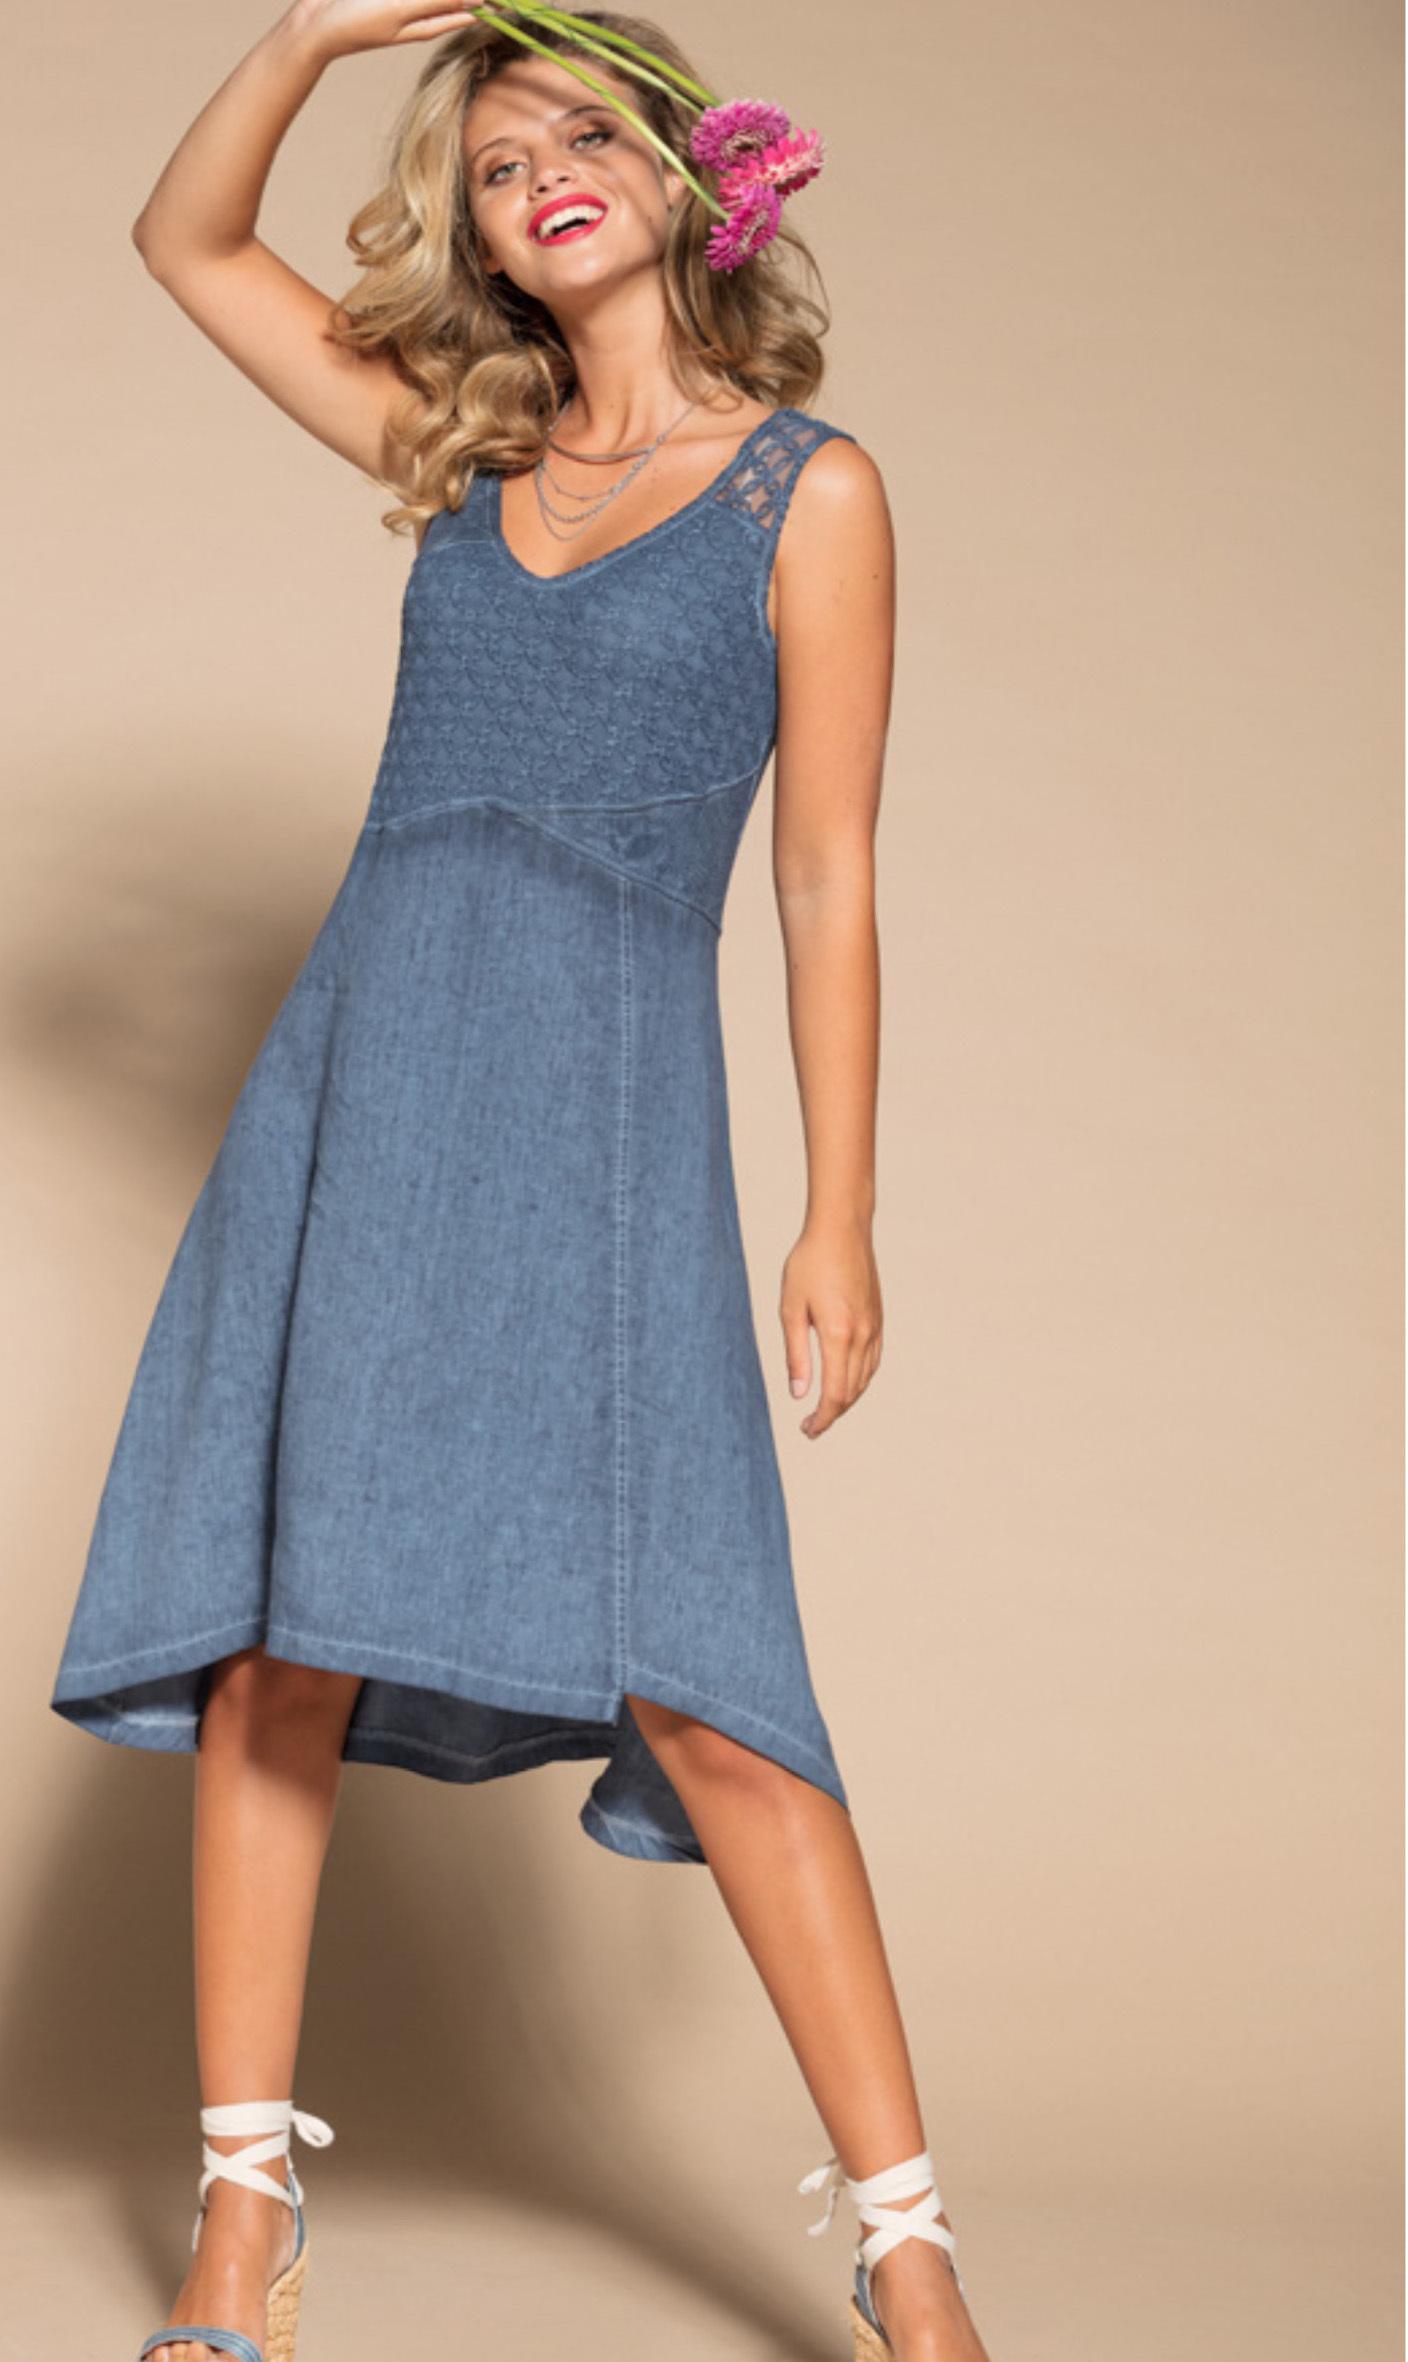 Maloka: Brushed Cotton High Waisted Midi Dress MK_TEDDIE